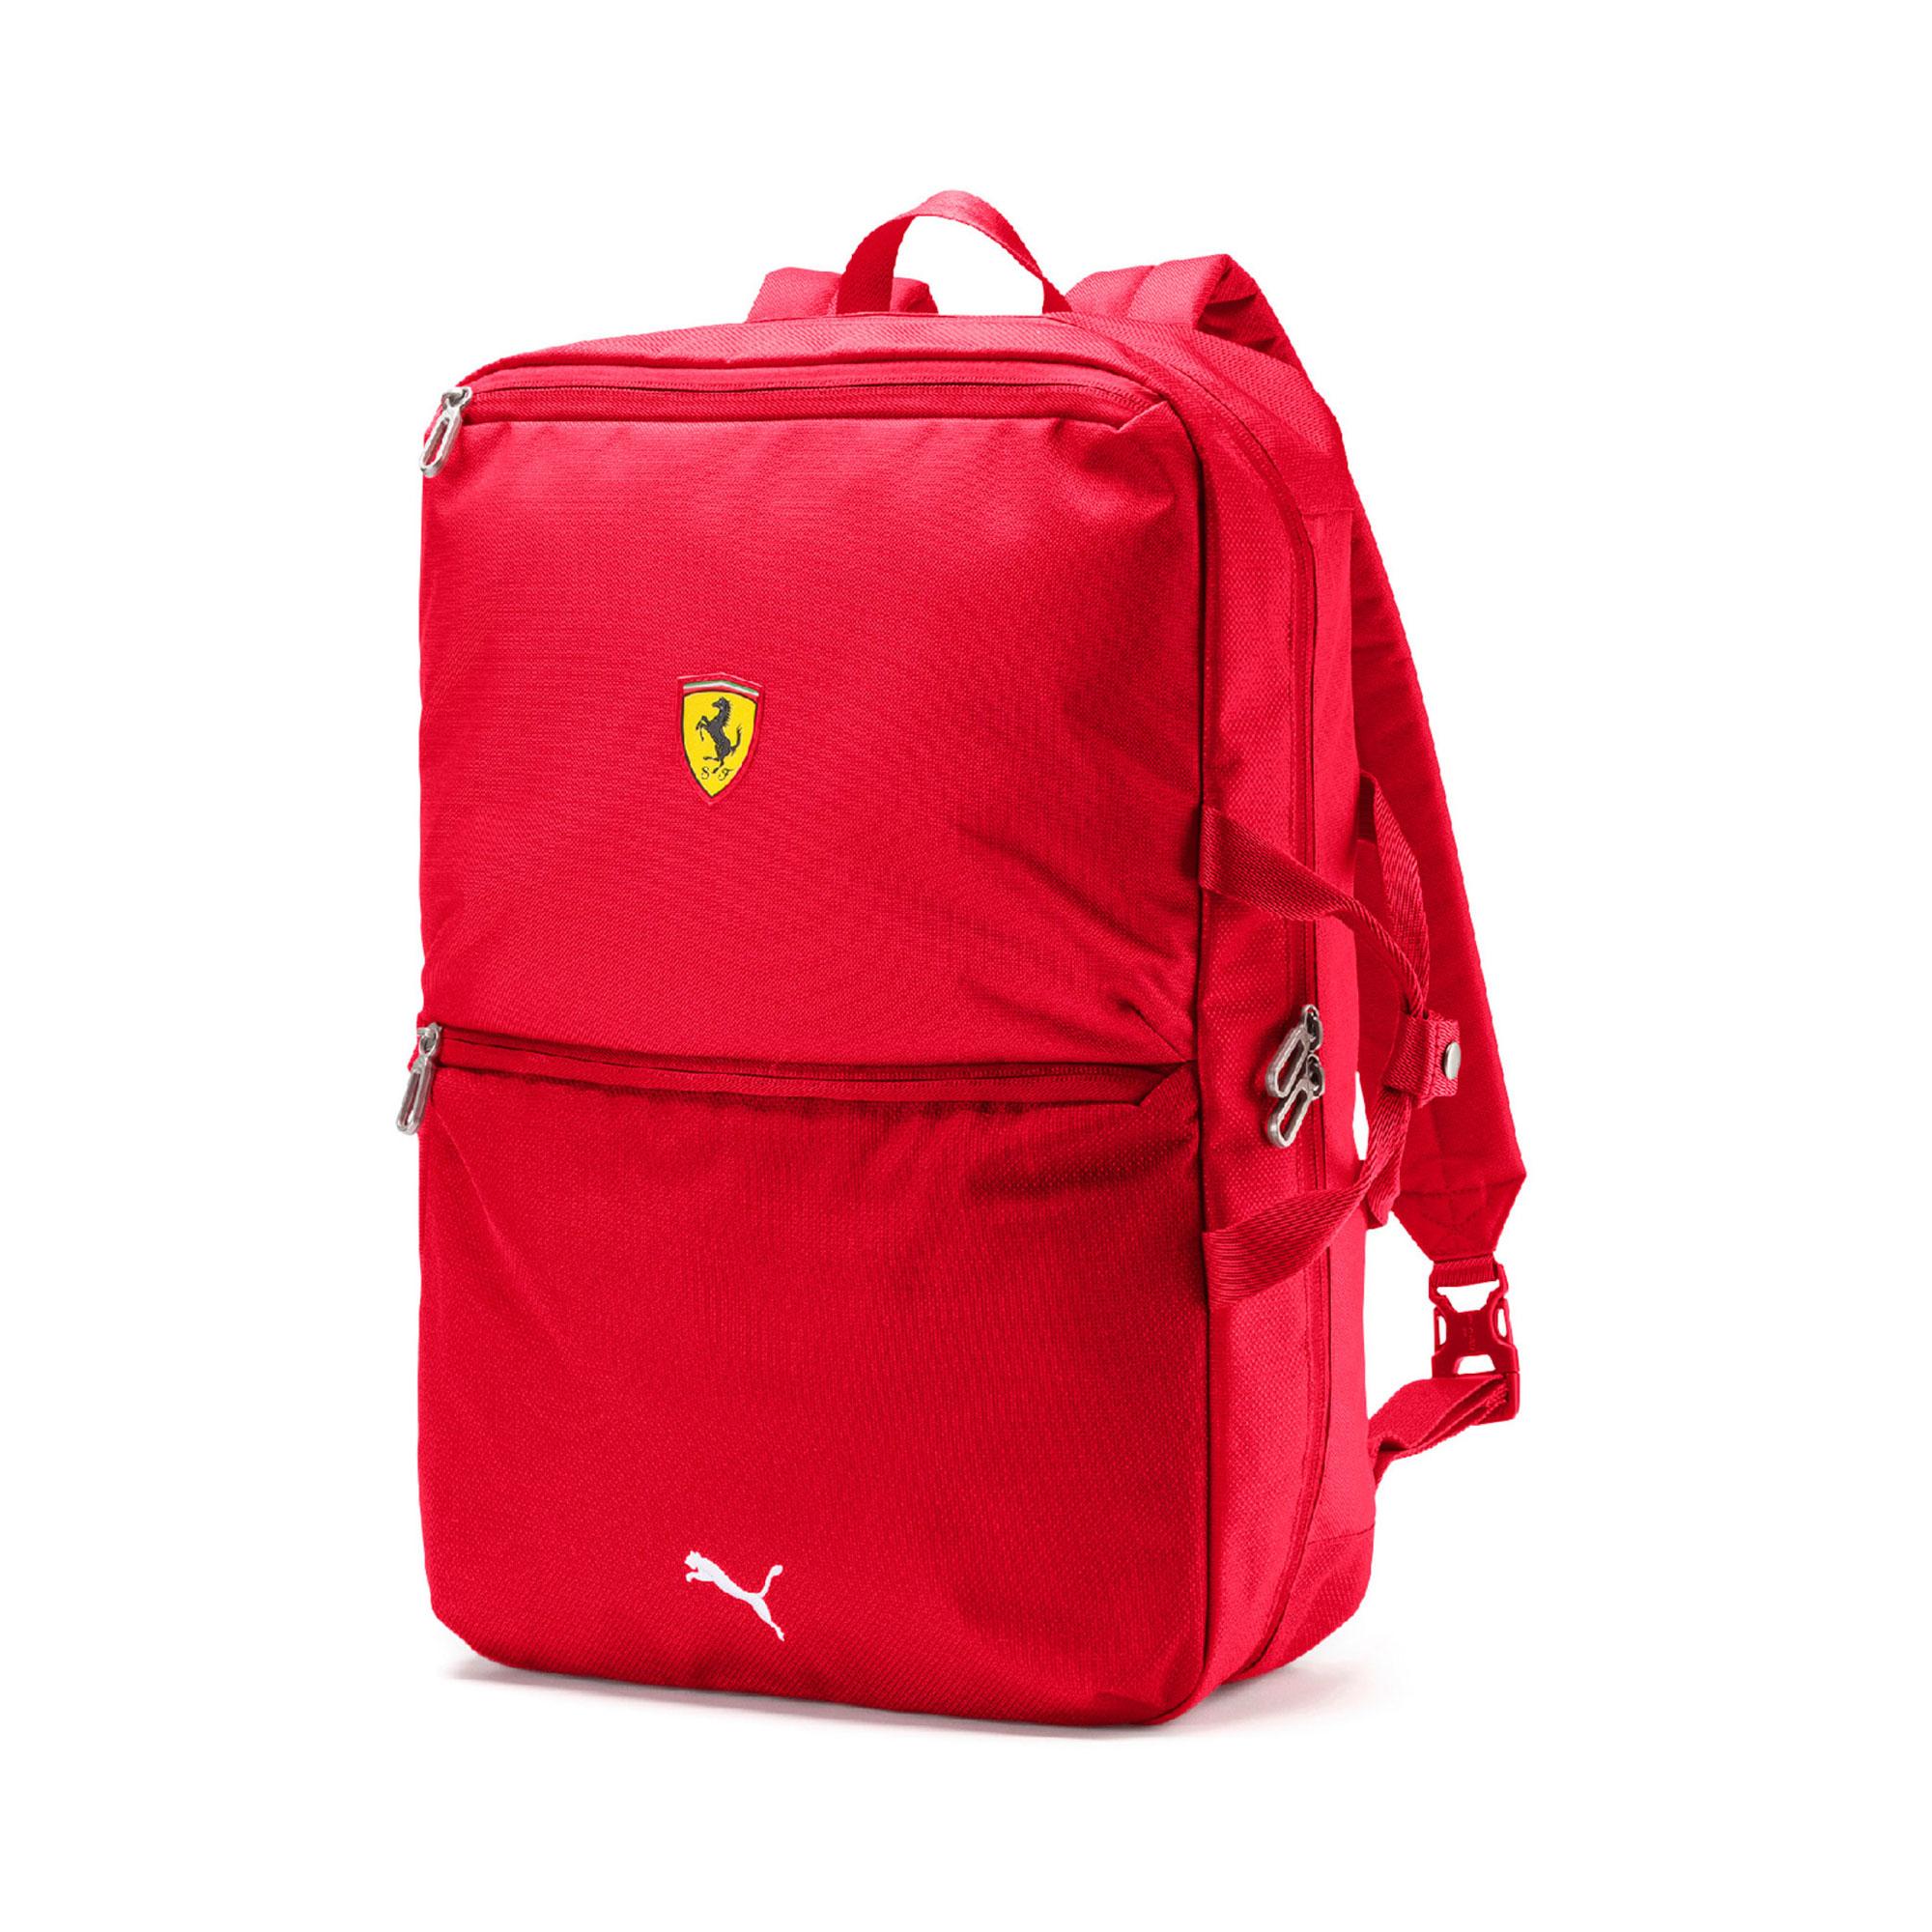 db294cef56772 Puma Ferrari team backpack 2019